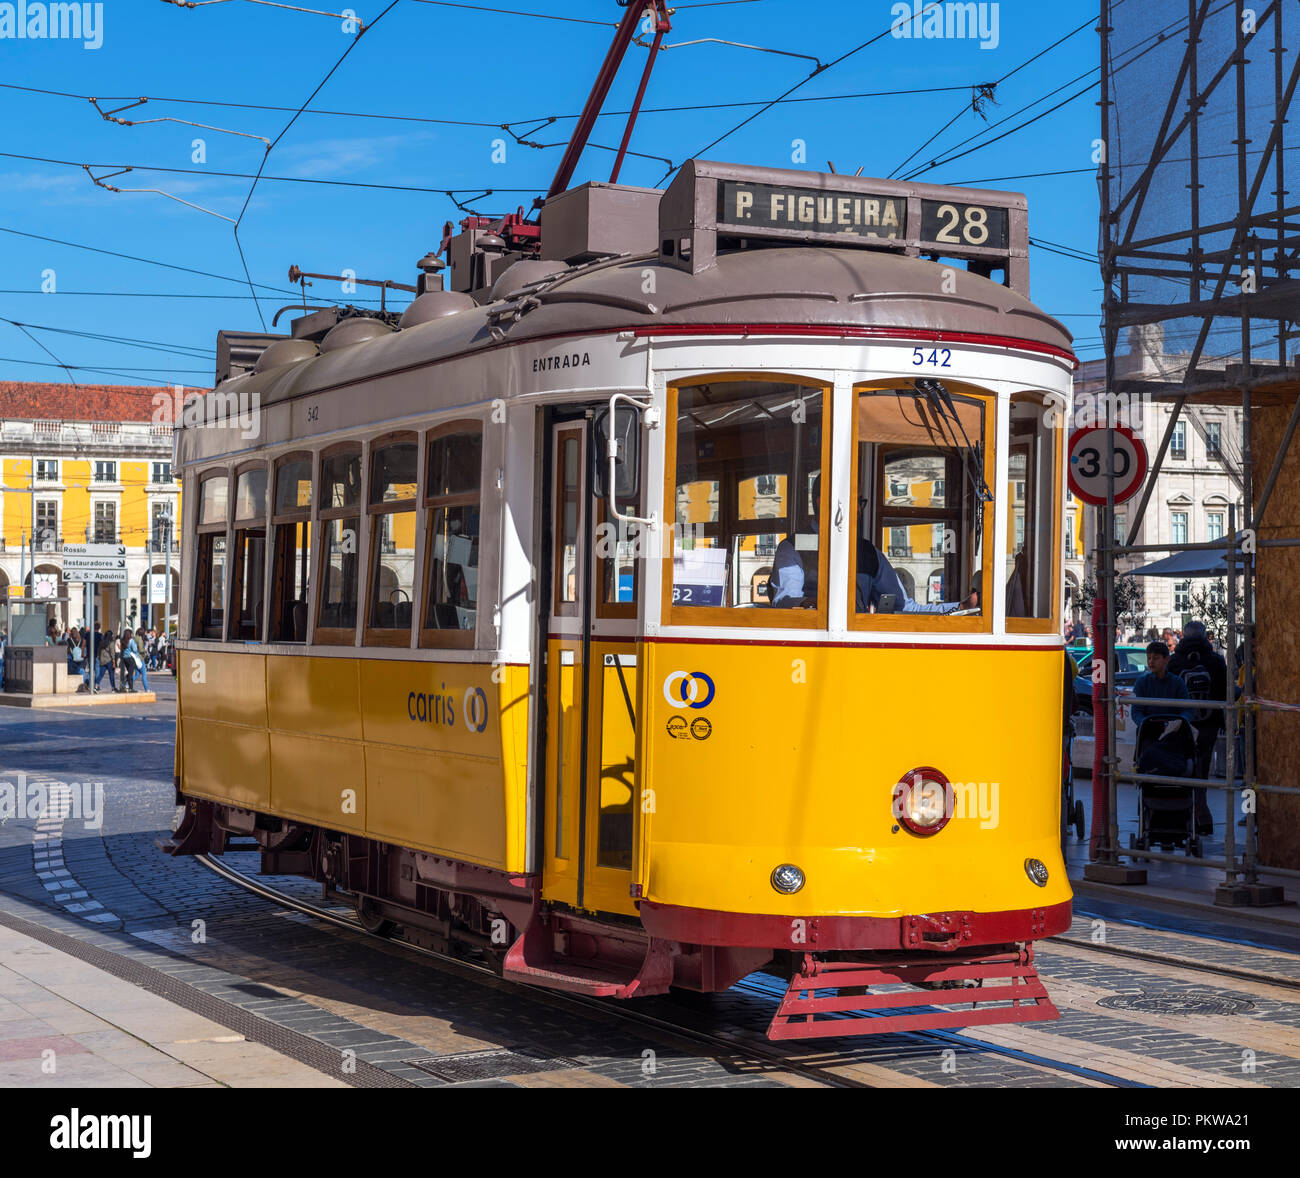 Lisbon tram in Praca do Imperio, Belem district, Lisbon, Portugal - Stock Image